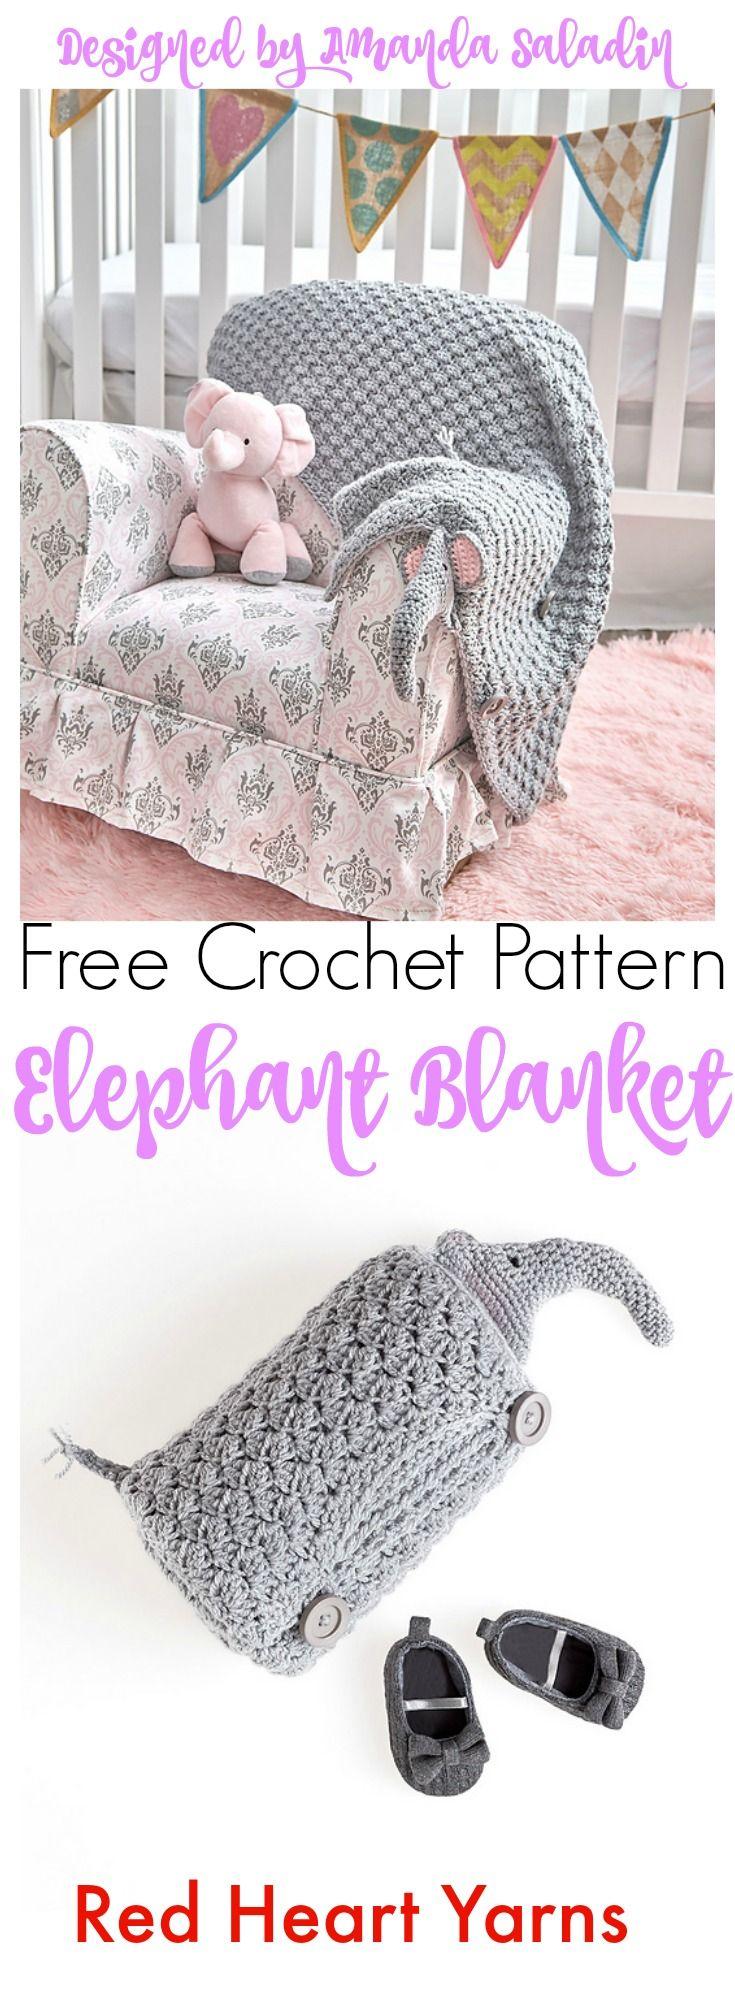 Elephant Blanket - Free Crochet Pattern | Cobija, Manta y Colchas ...